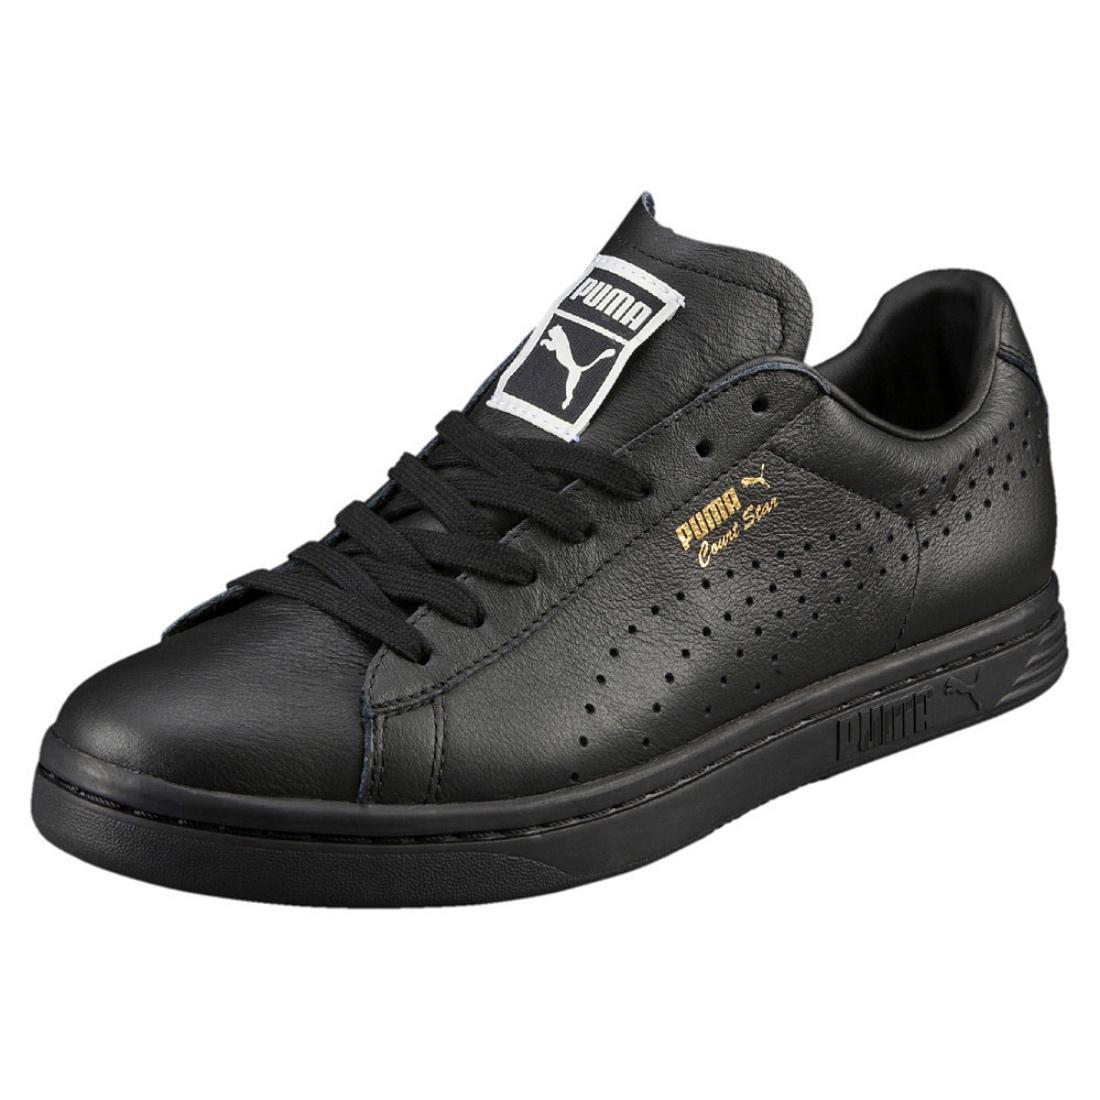 1cc8ebcc5f84 Puma Court Star NM Unisex Adult Sneakers Trainers 357883 Black